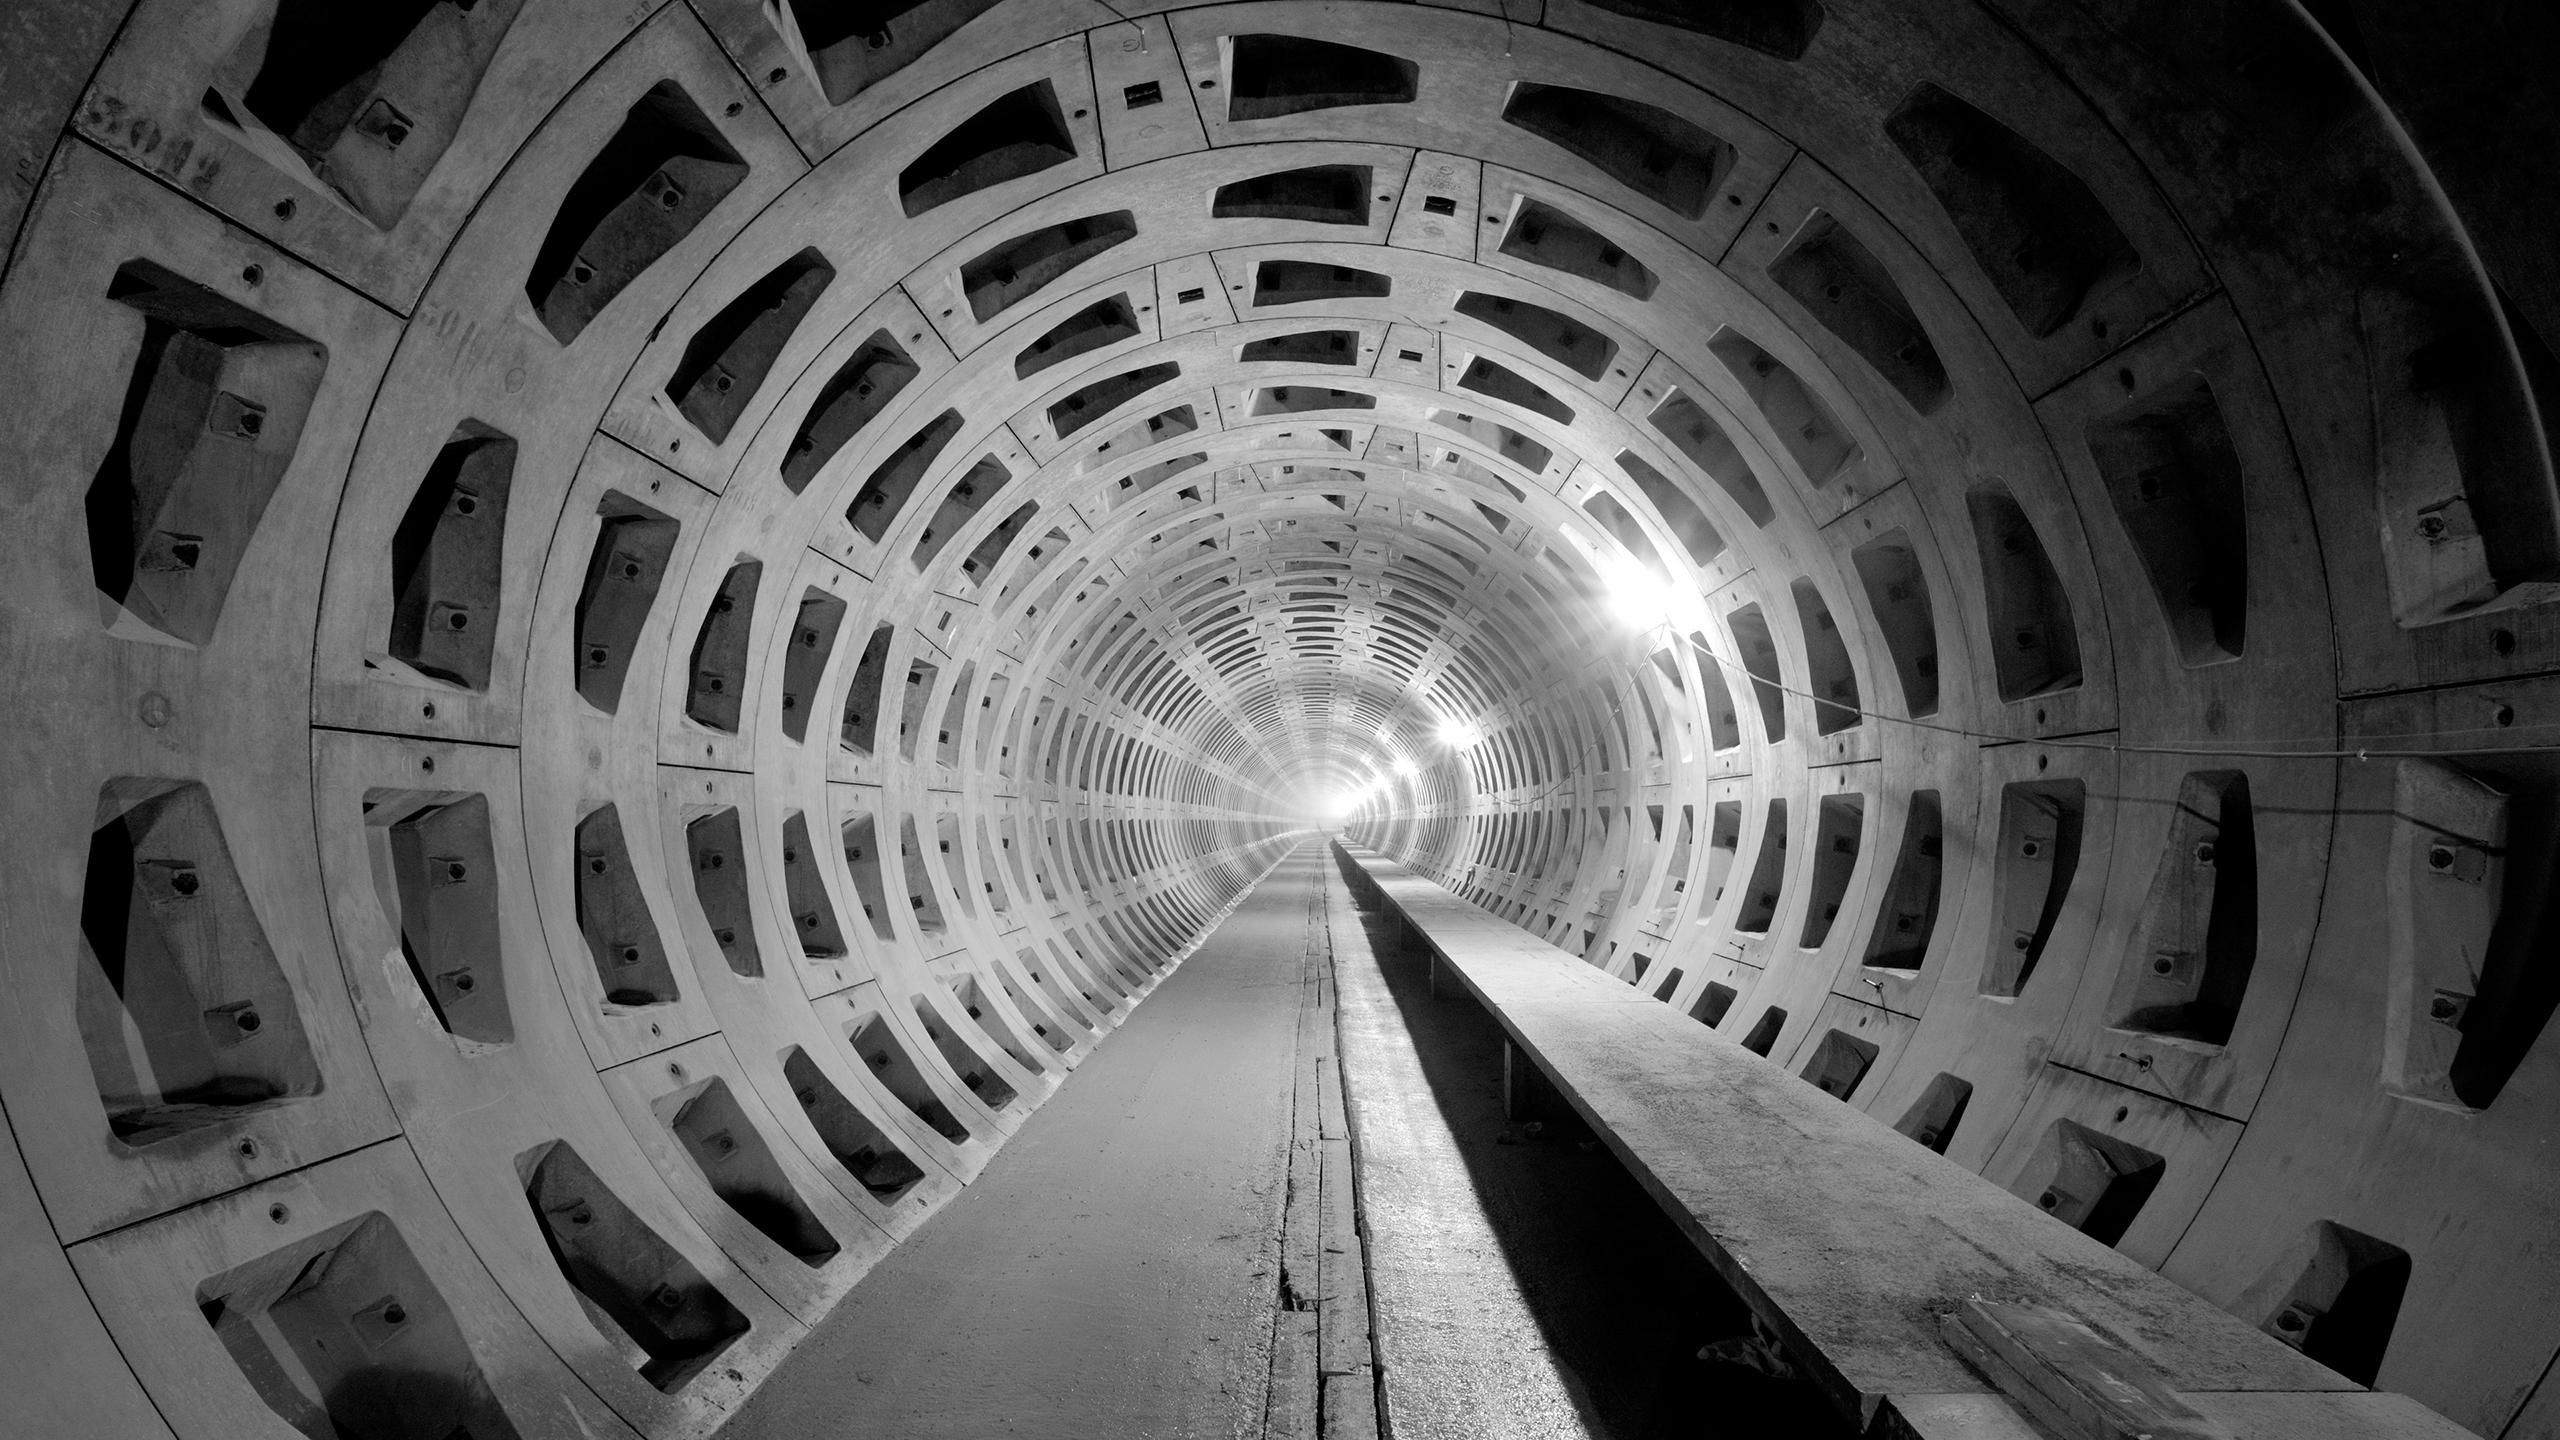 lost_underground_tube_of_doom_wallpaper_2560x1440